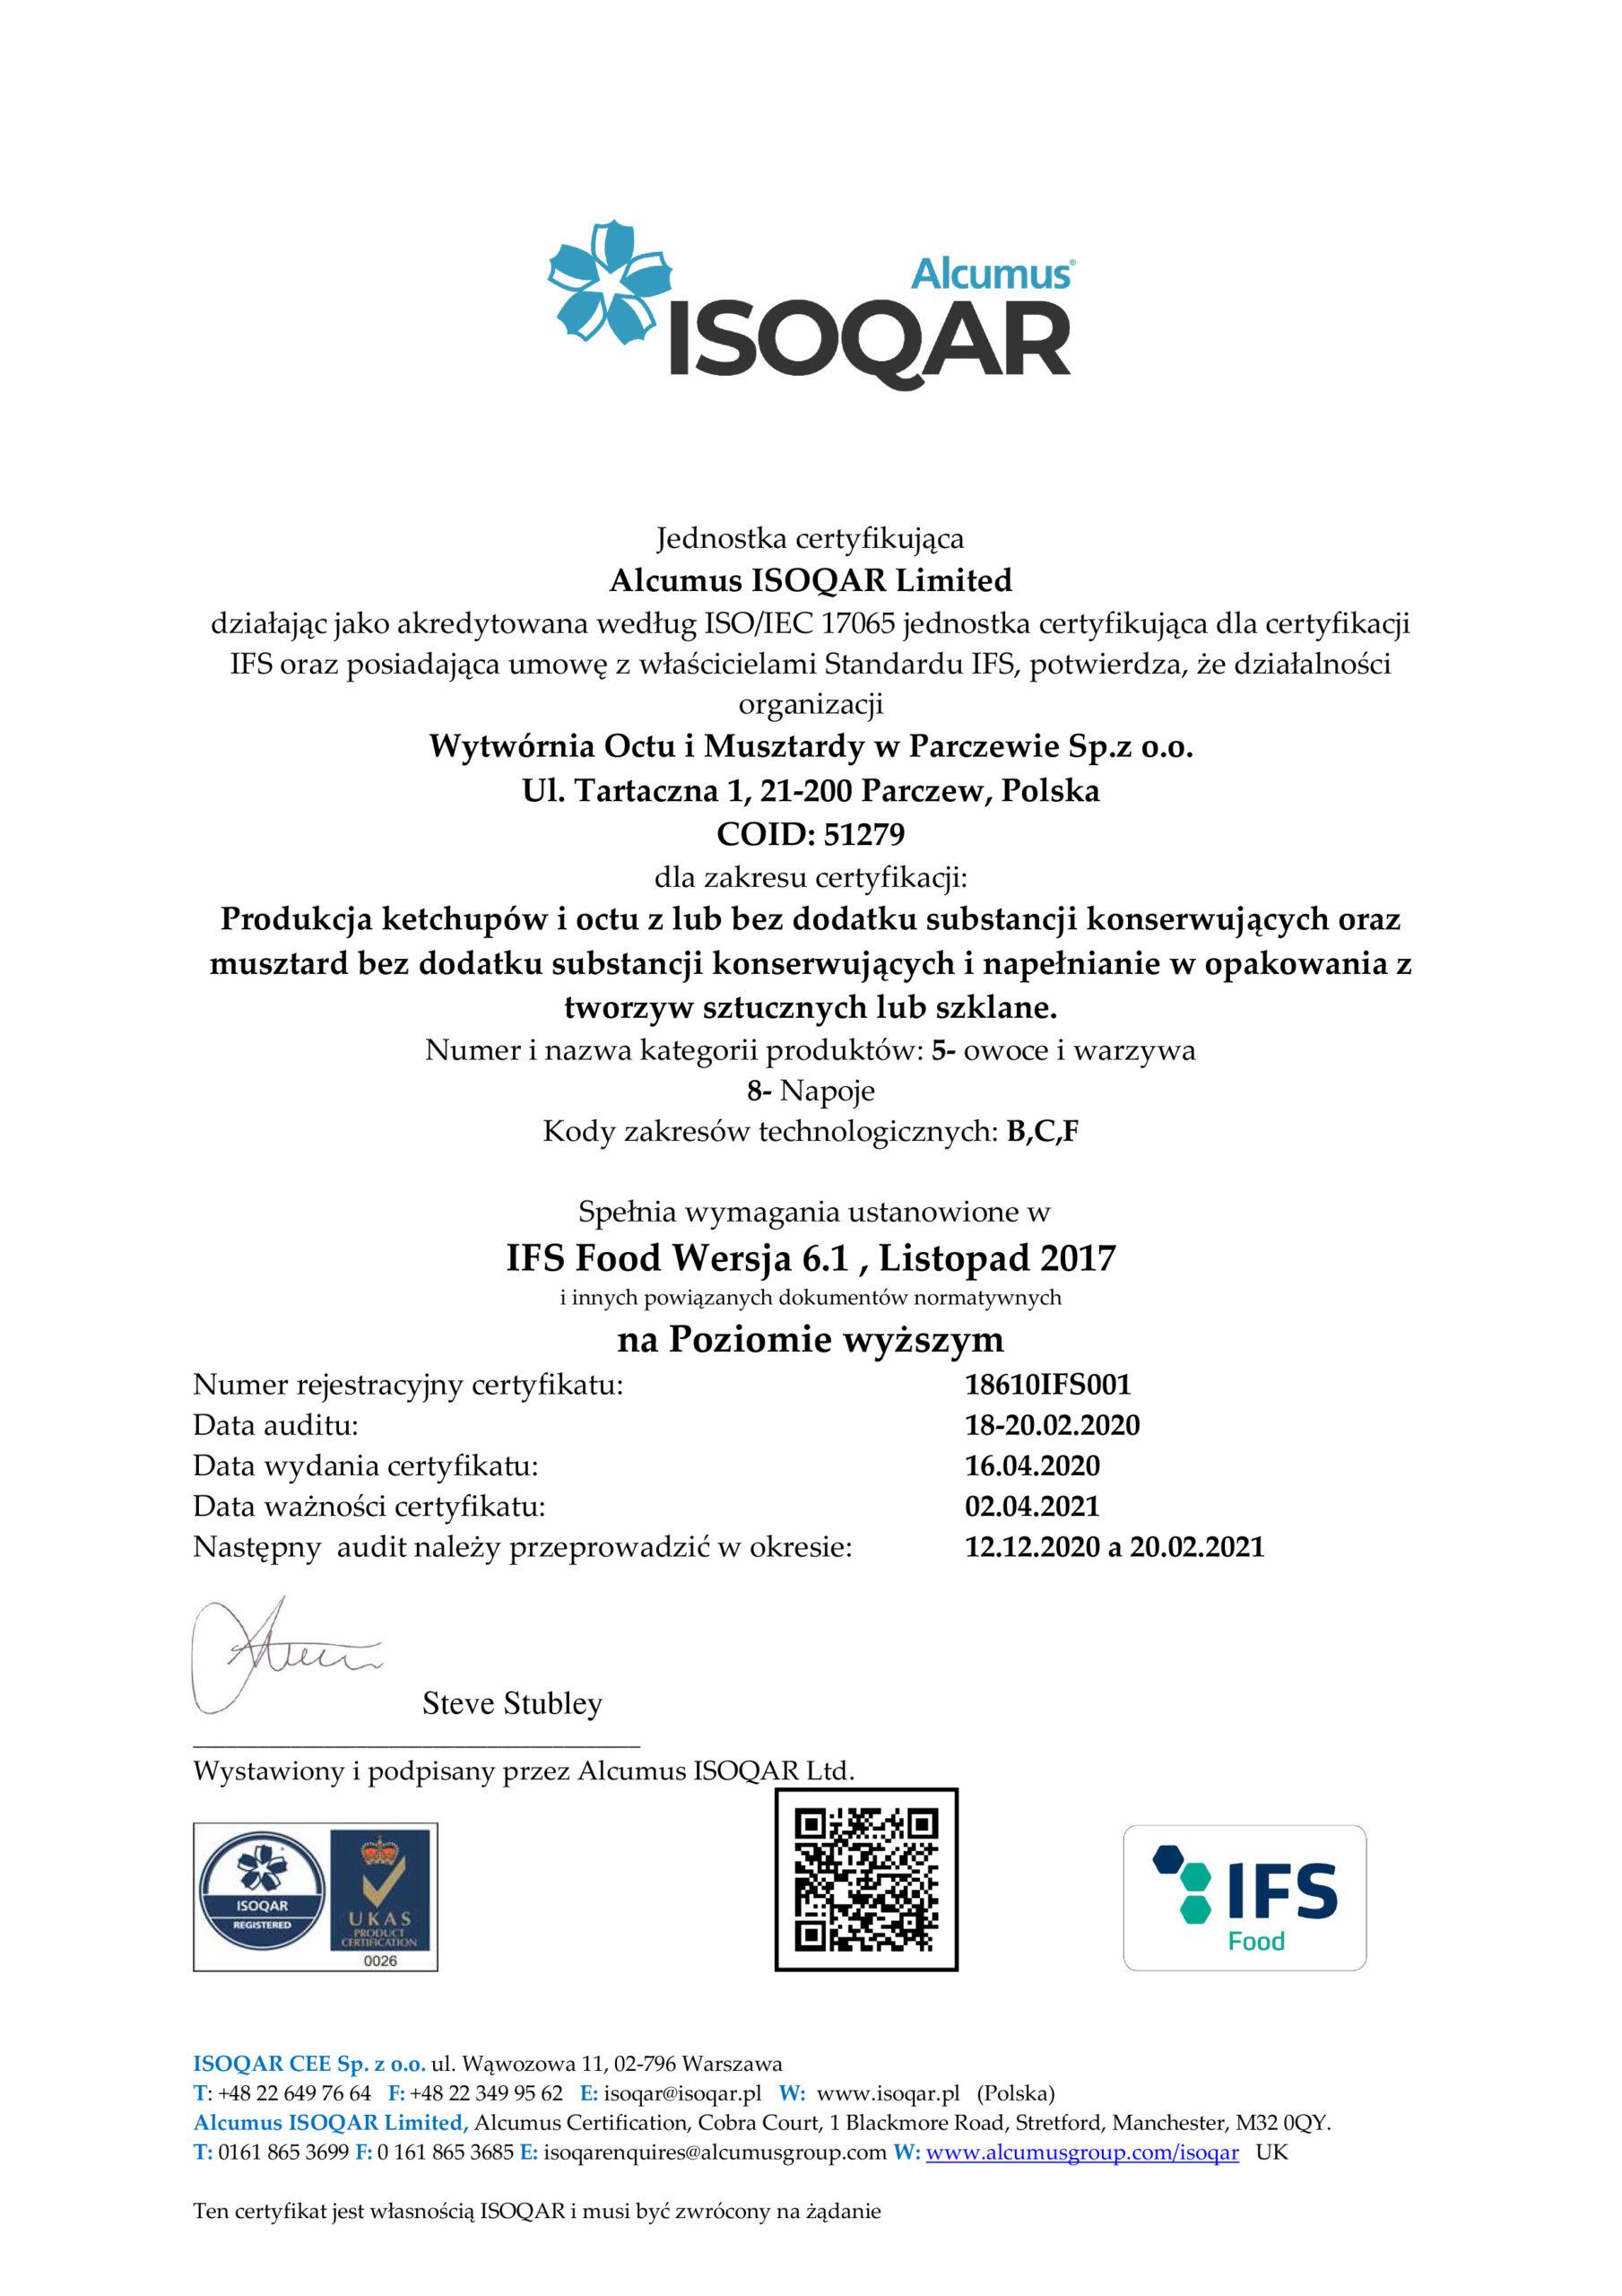 IFS-scaled